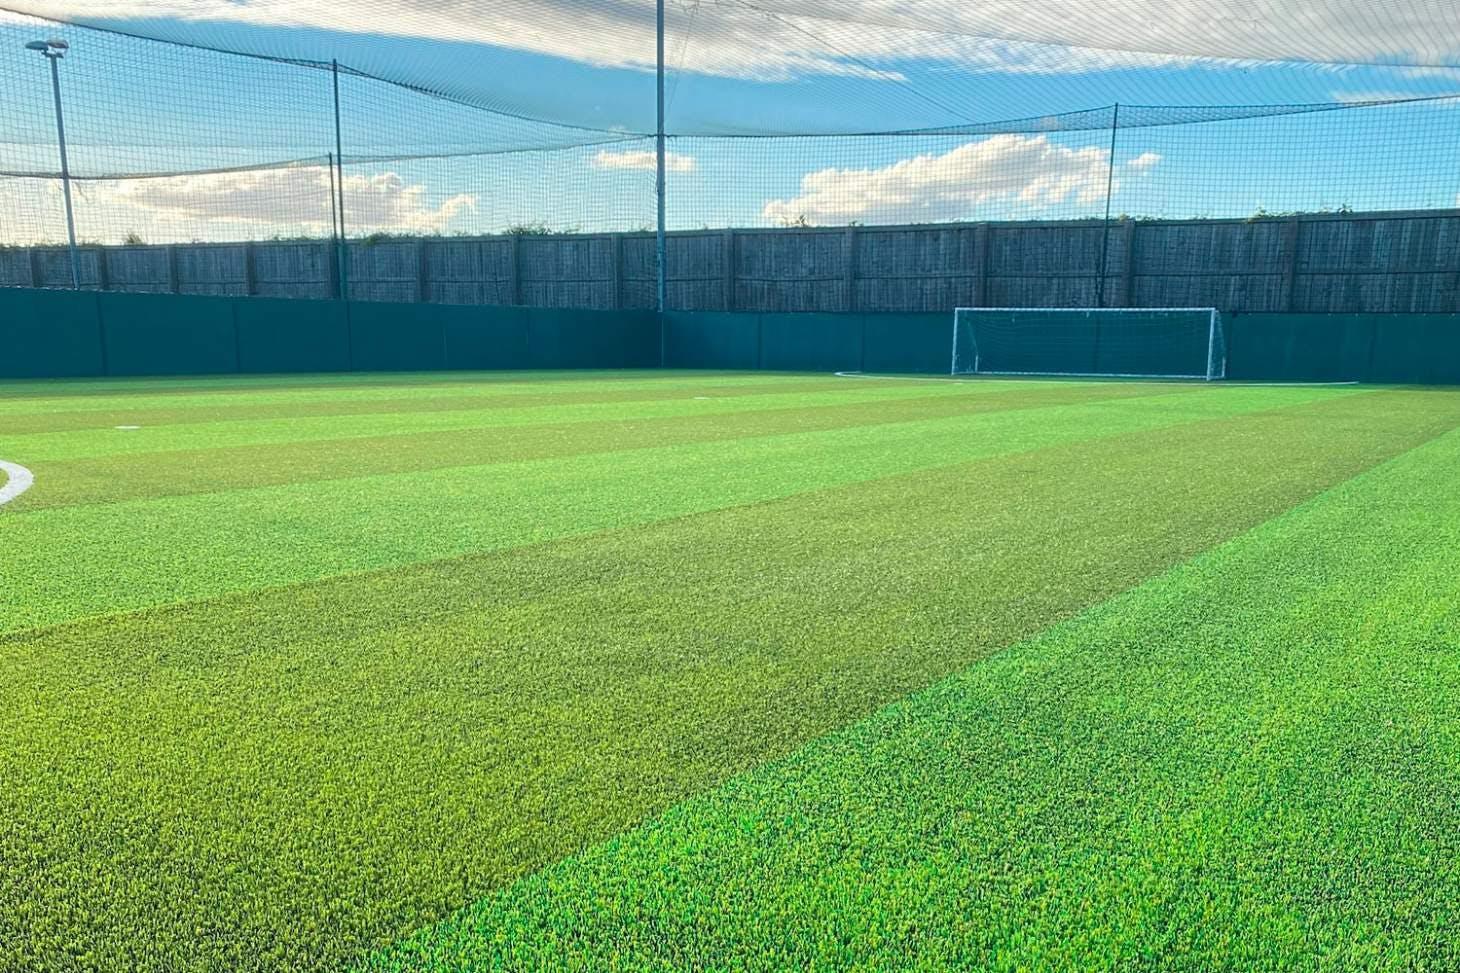 Powerleague Romford 5 a side | 3G Astroturf football pitch